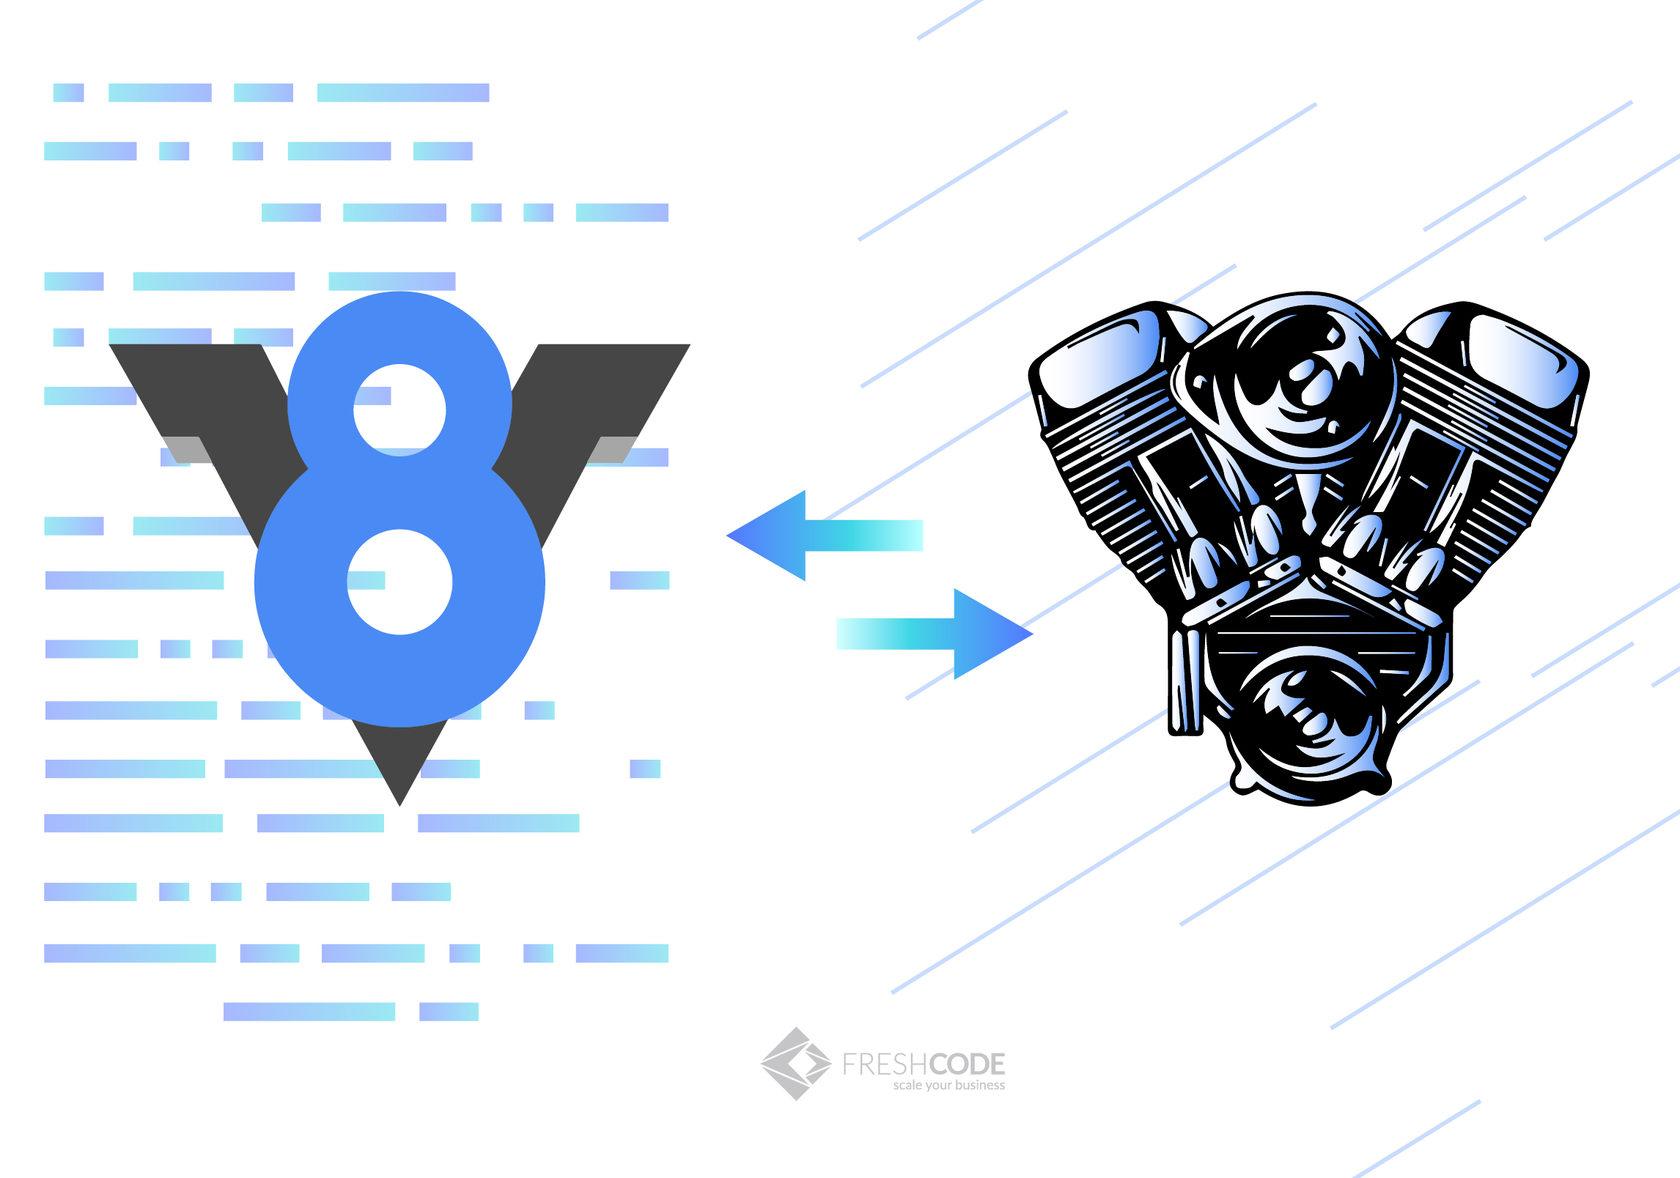 V8 engine graphic